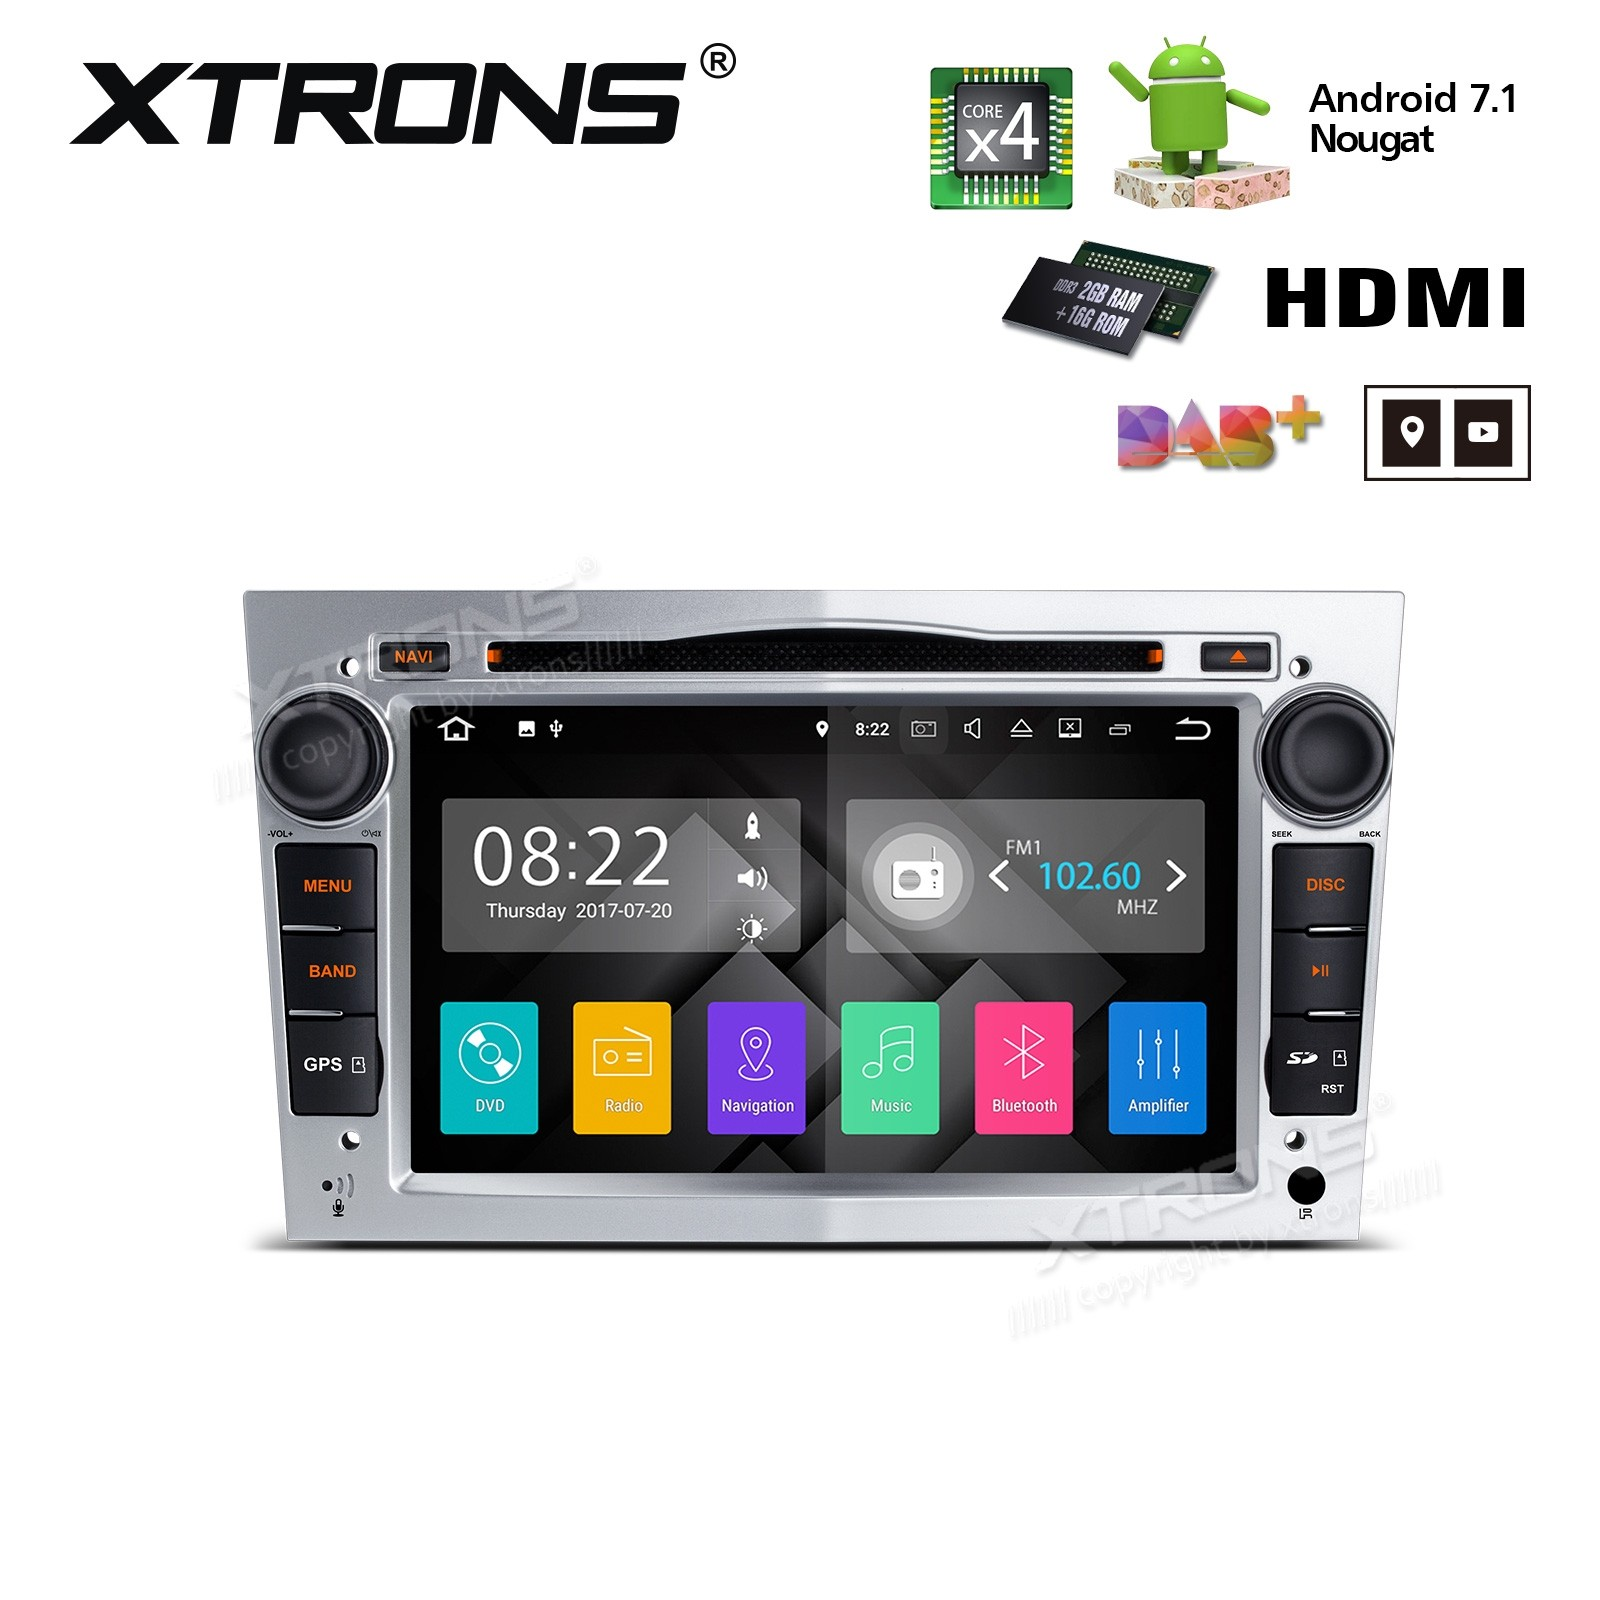 XTRONS PA77OLOP-S